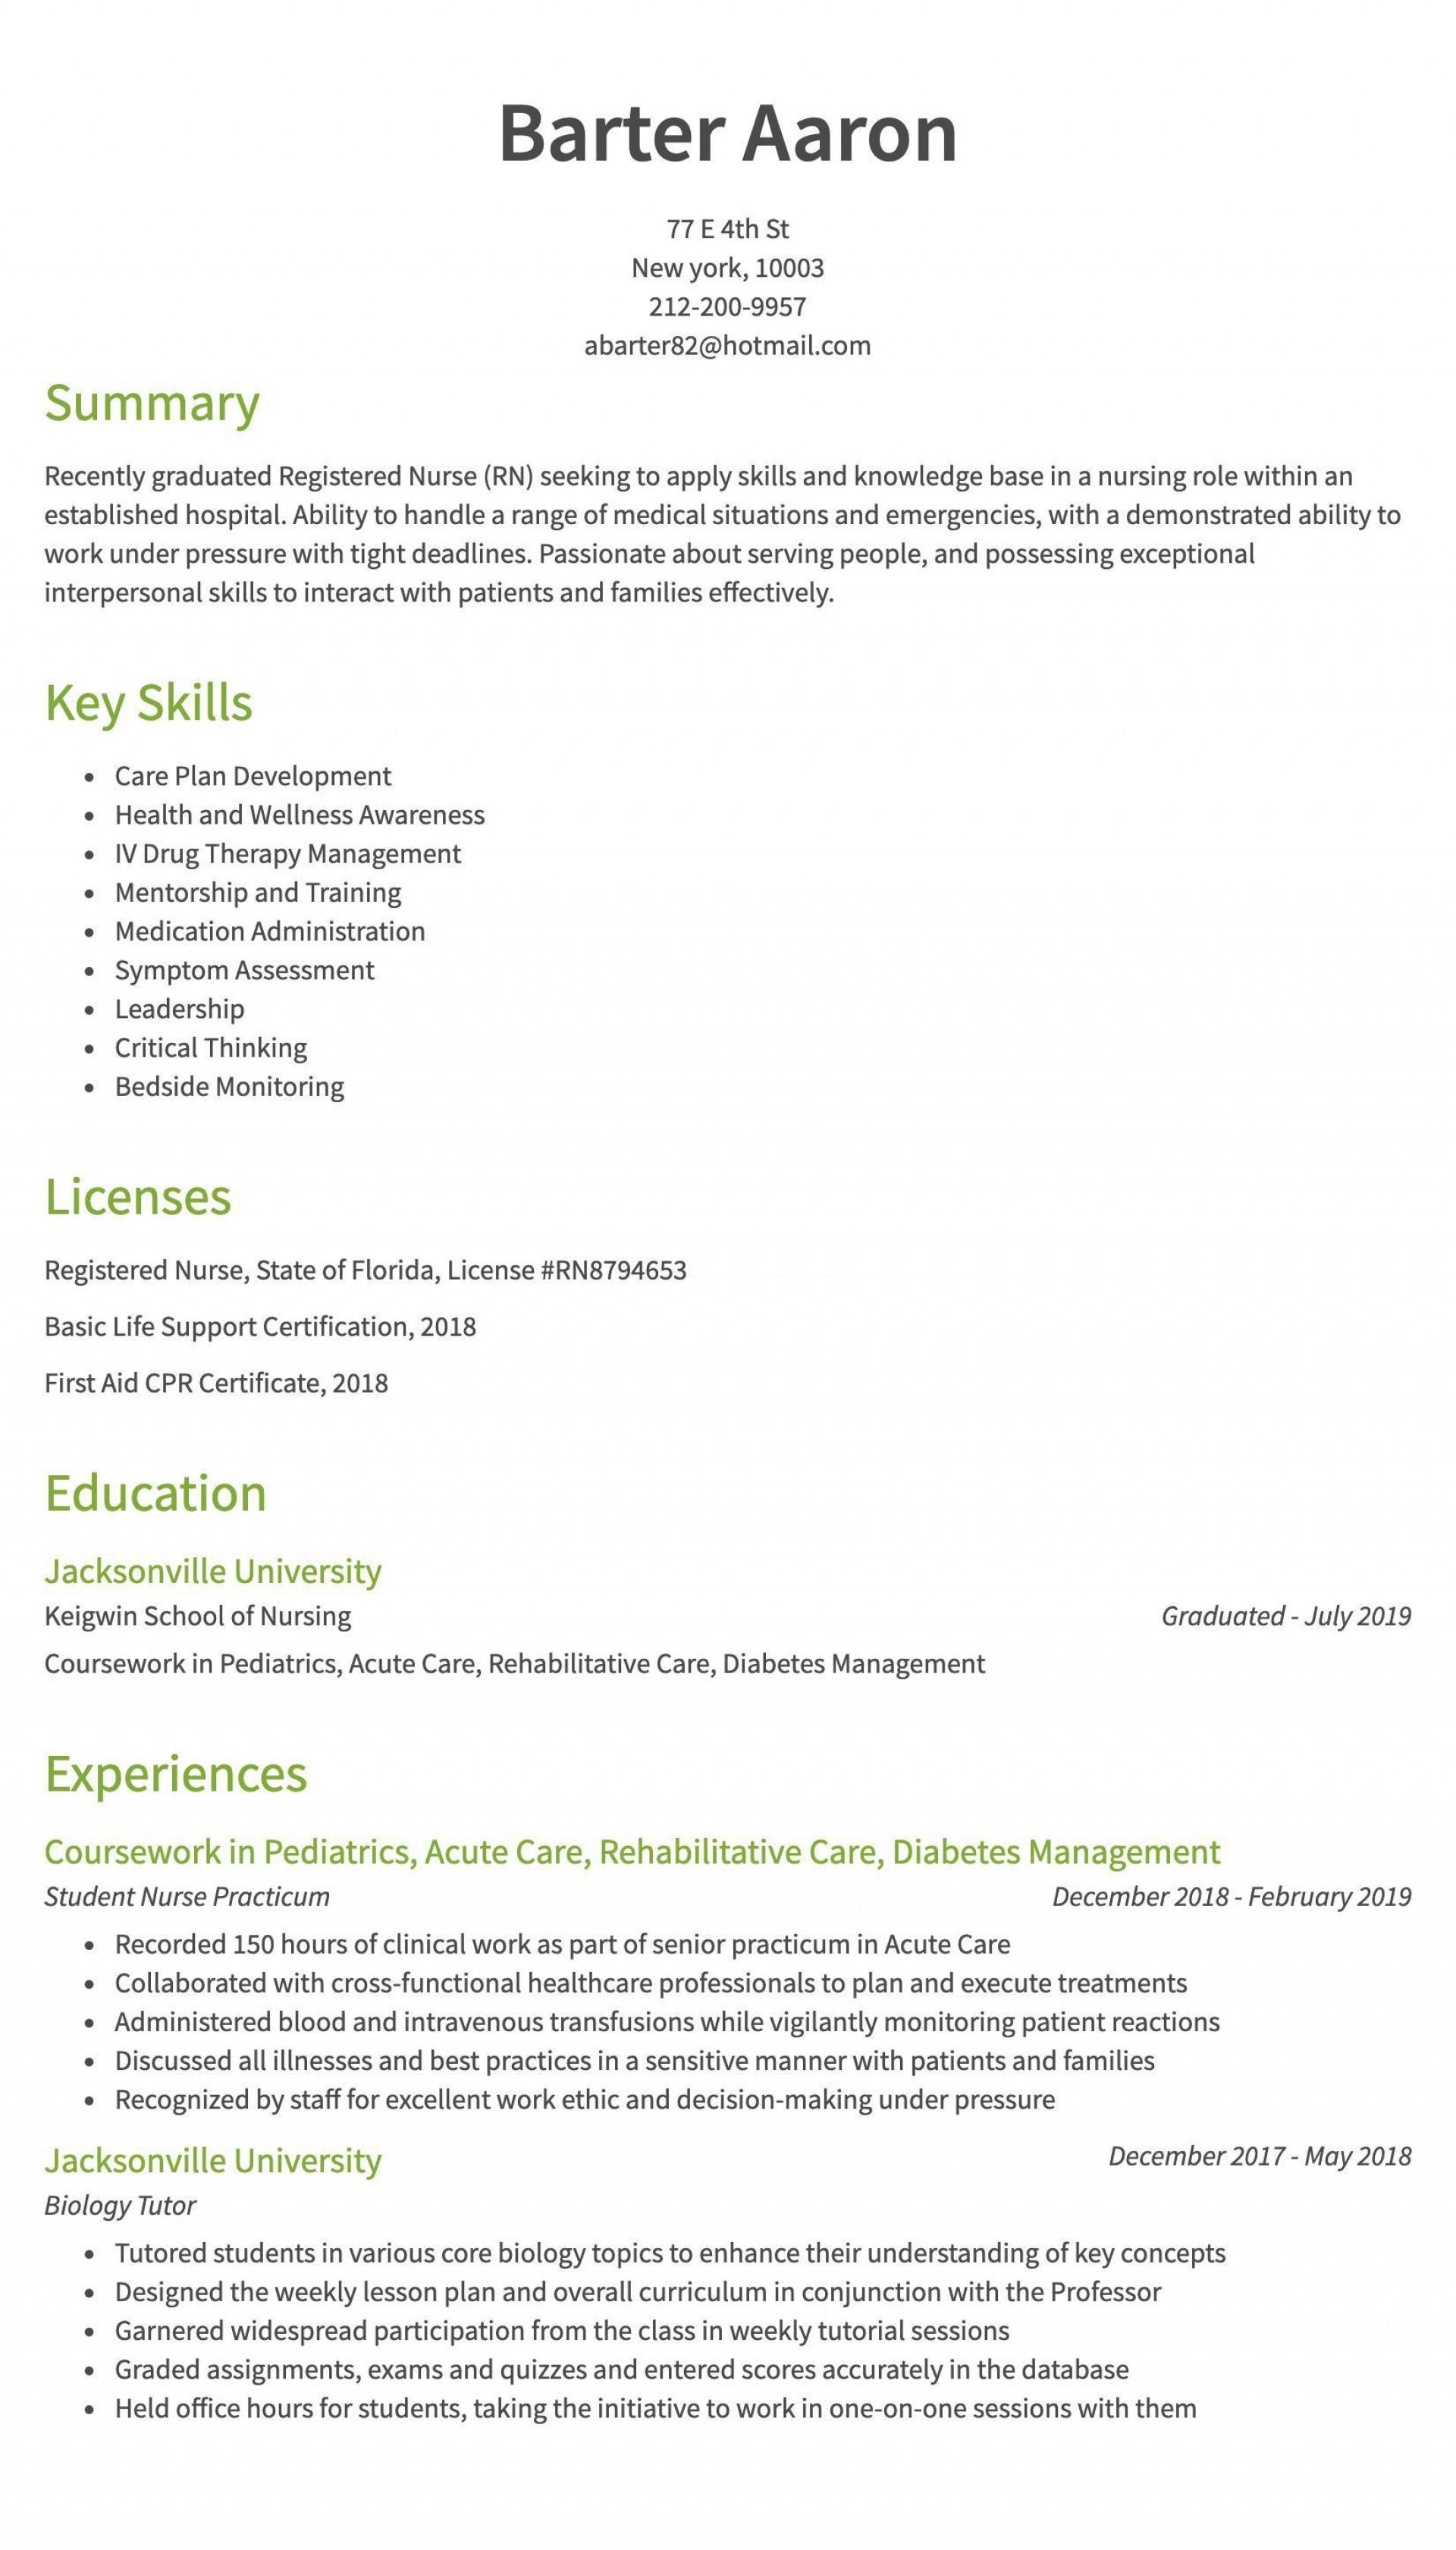 008 Remarkable Rn Graduate Resume Template High Resolution  New Nurse Practitioner1920